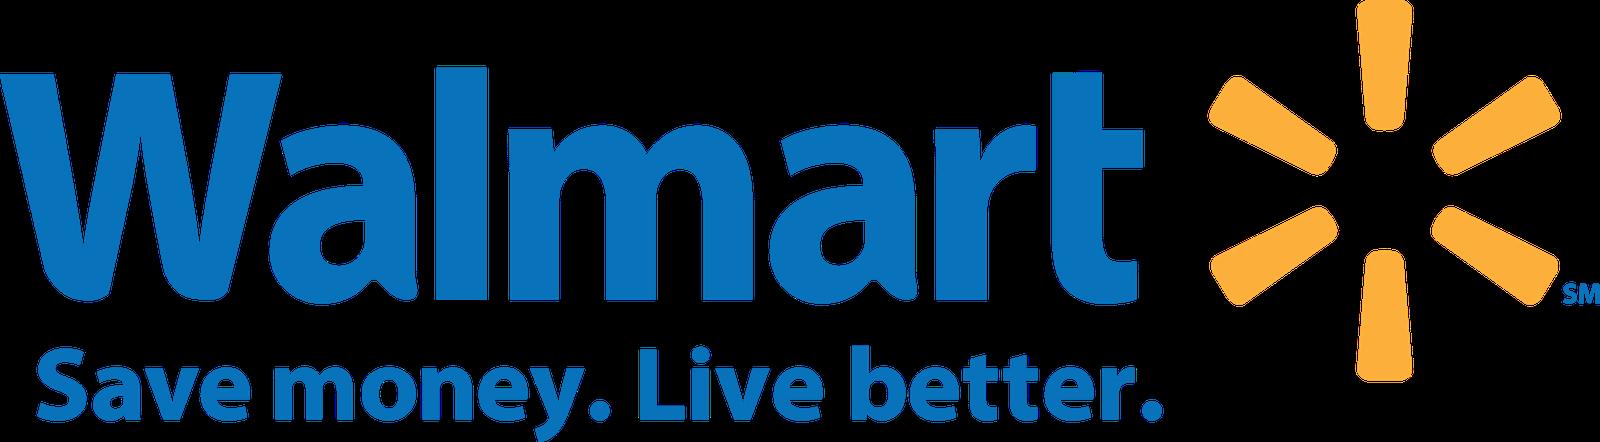 Walmart Clipart.